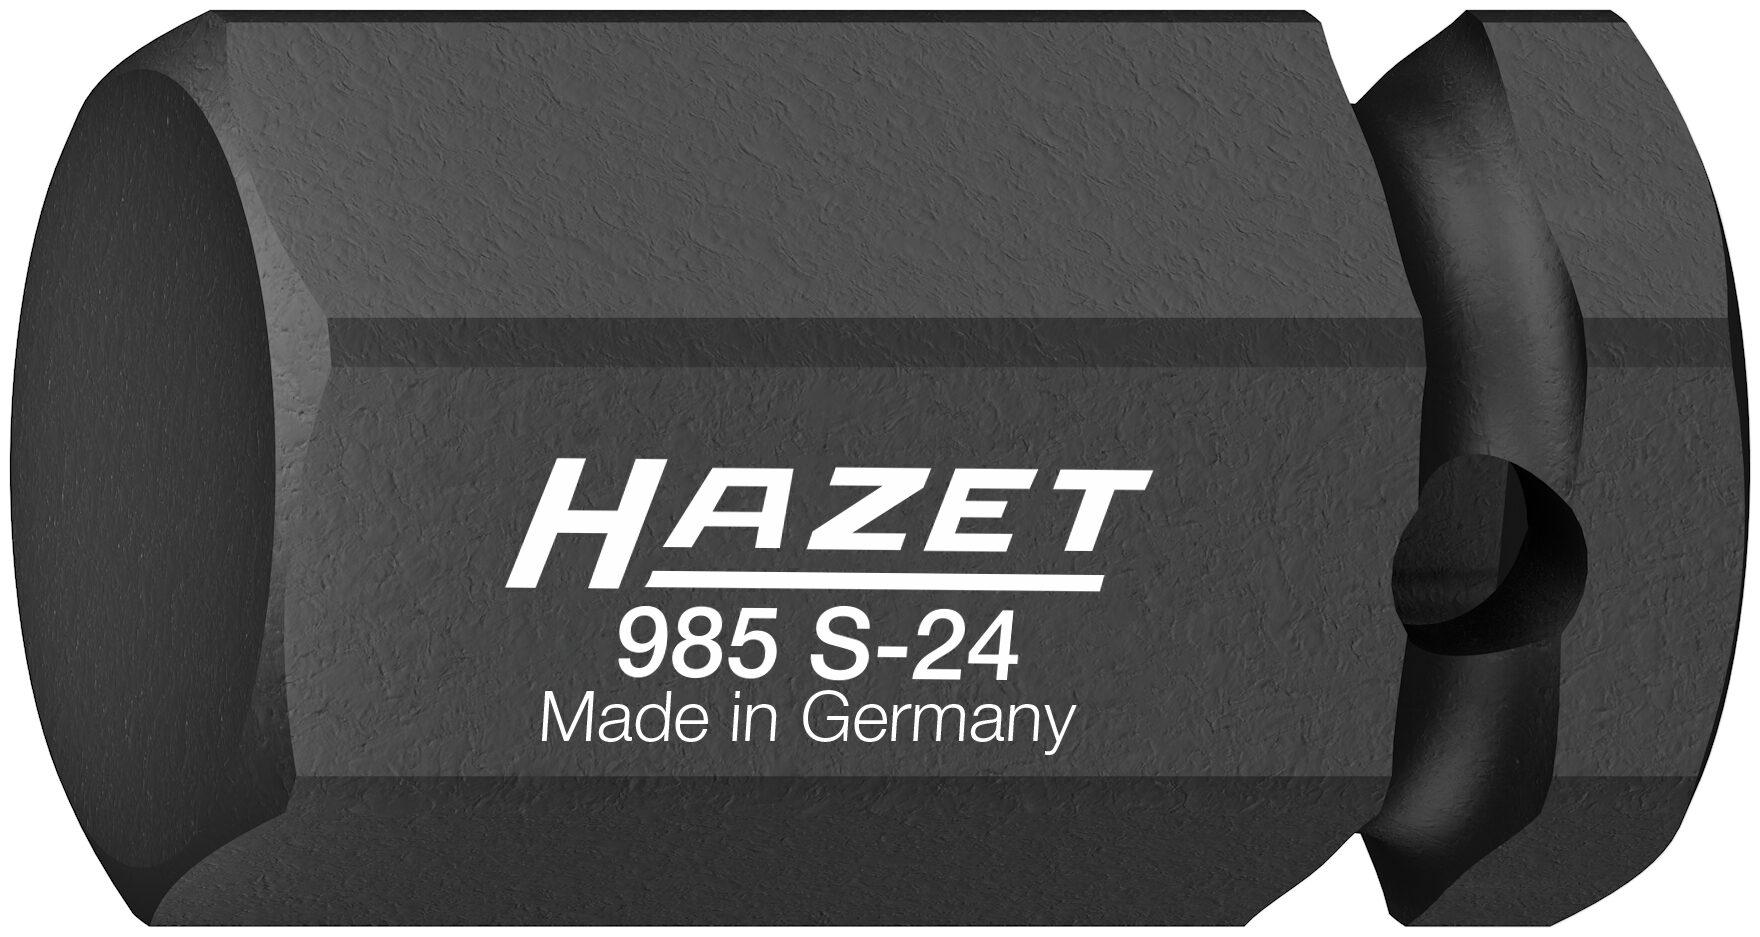 HAZET Schlag- ∙ Maschinenschrauber Schraubendreher-Steckschlüsseleinsatz 985S-24 ∙ Vierkant hohl 12,5 mm (1/2 Zoll)